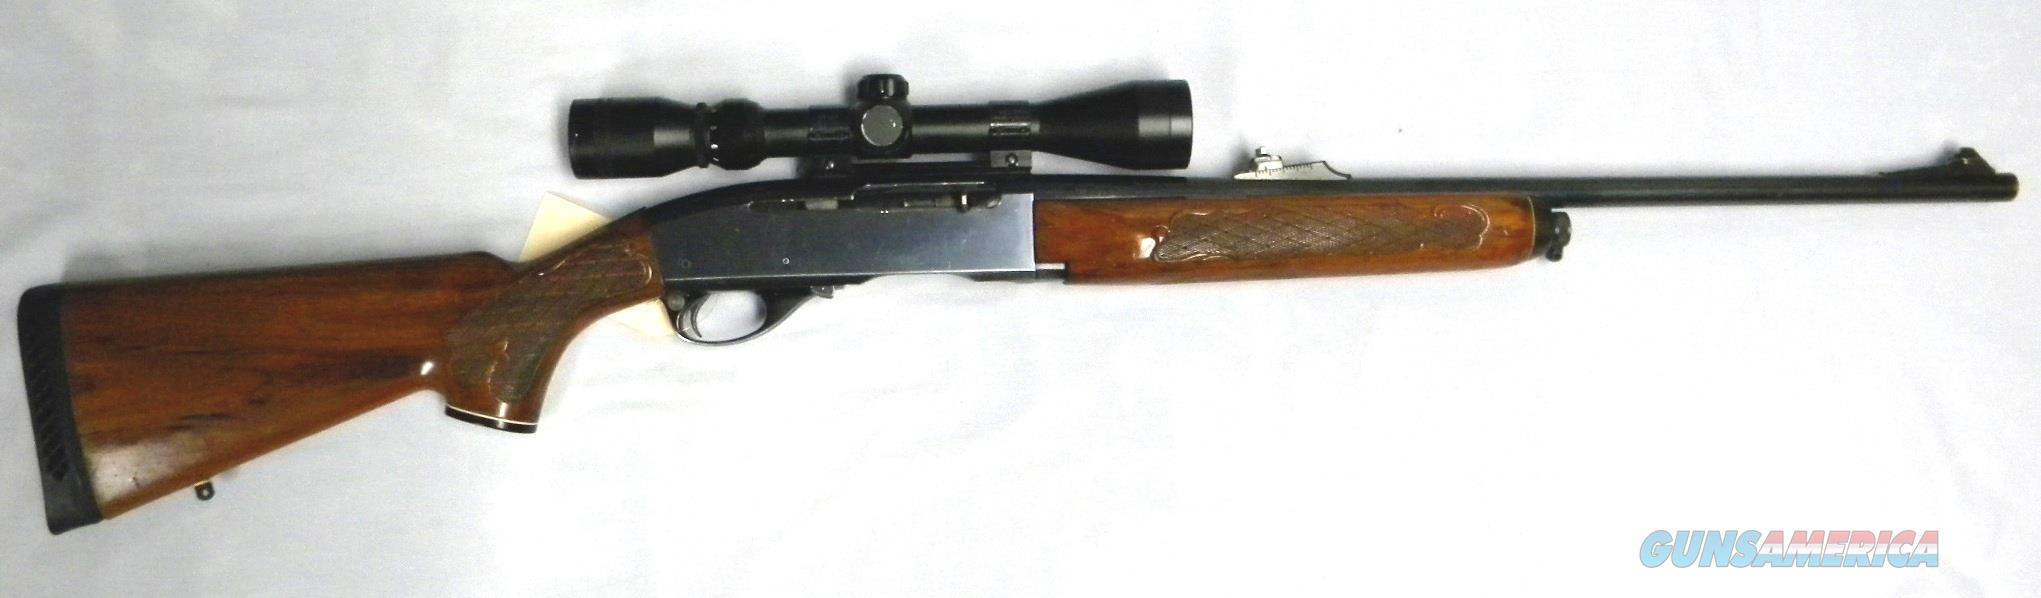 Remington 742(A) 'Woodsmaster'  30-06 Semi-Automatic Rifle